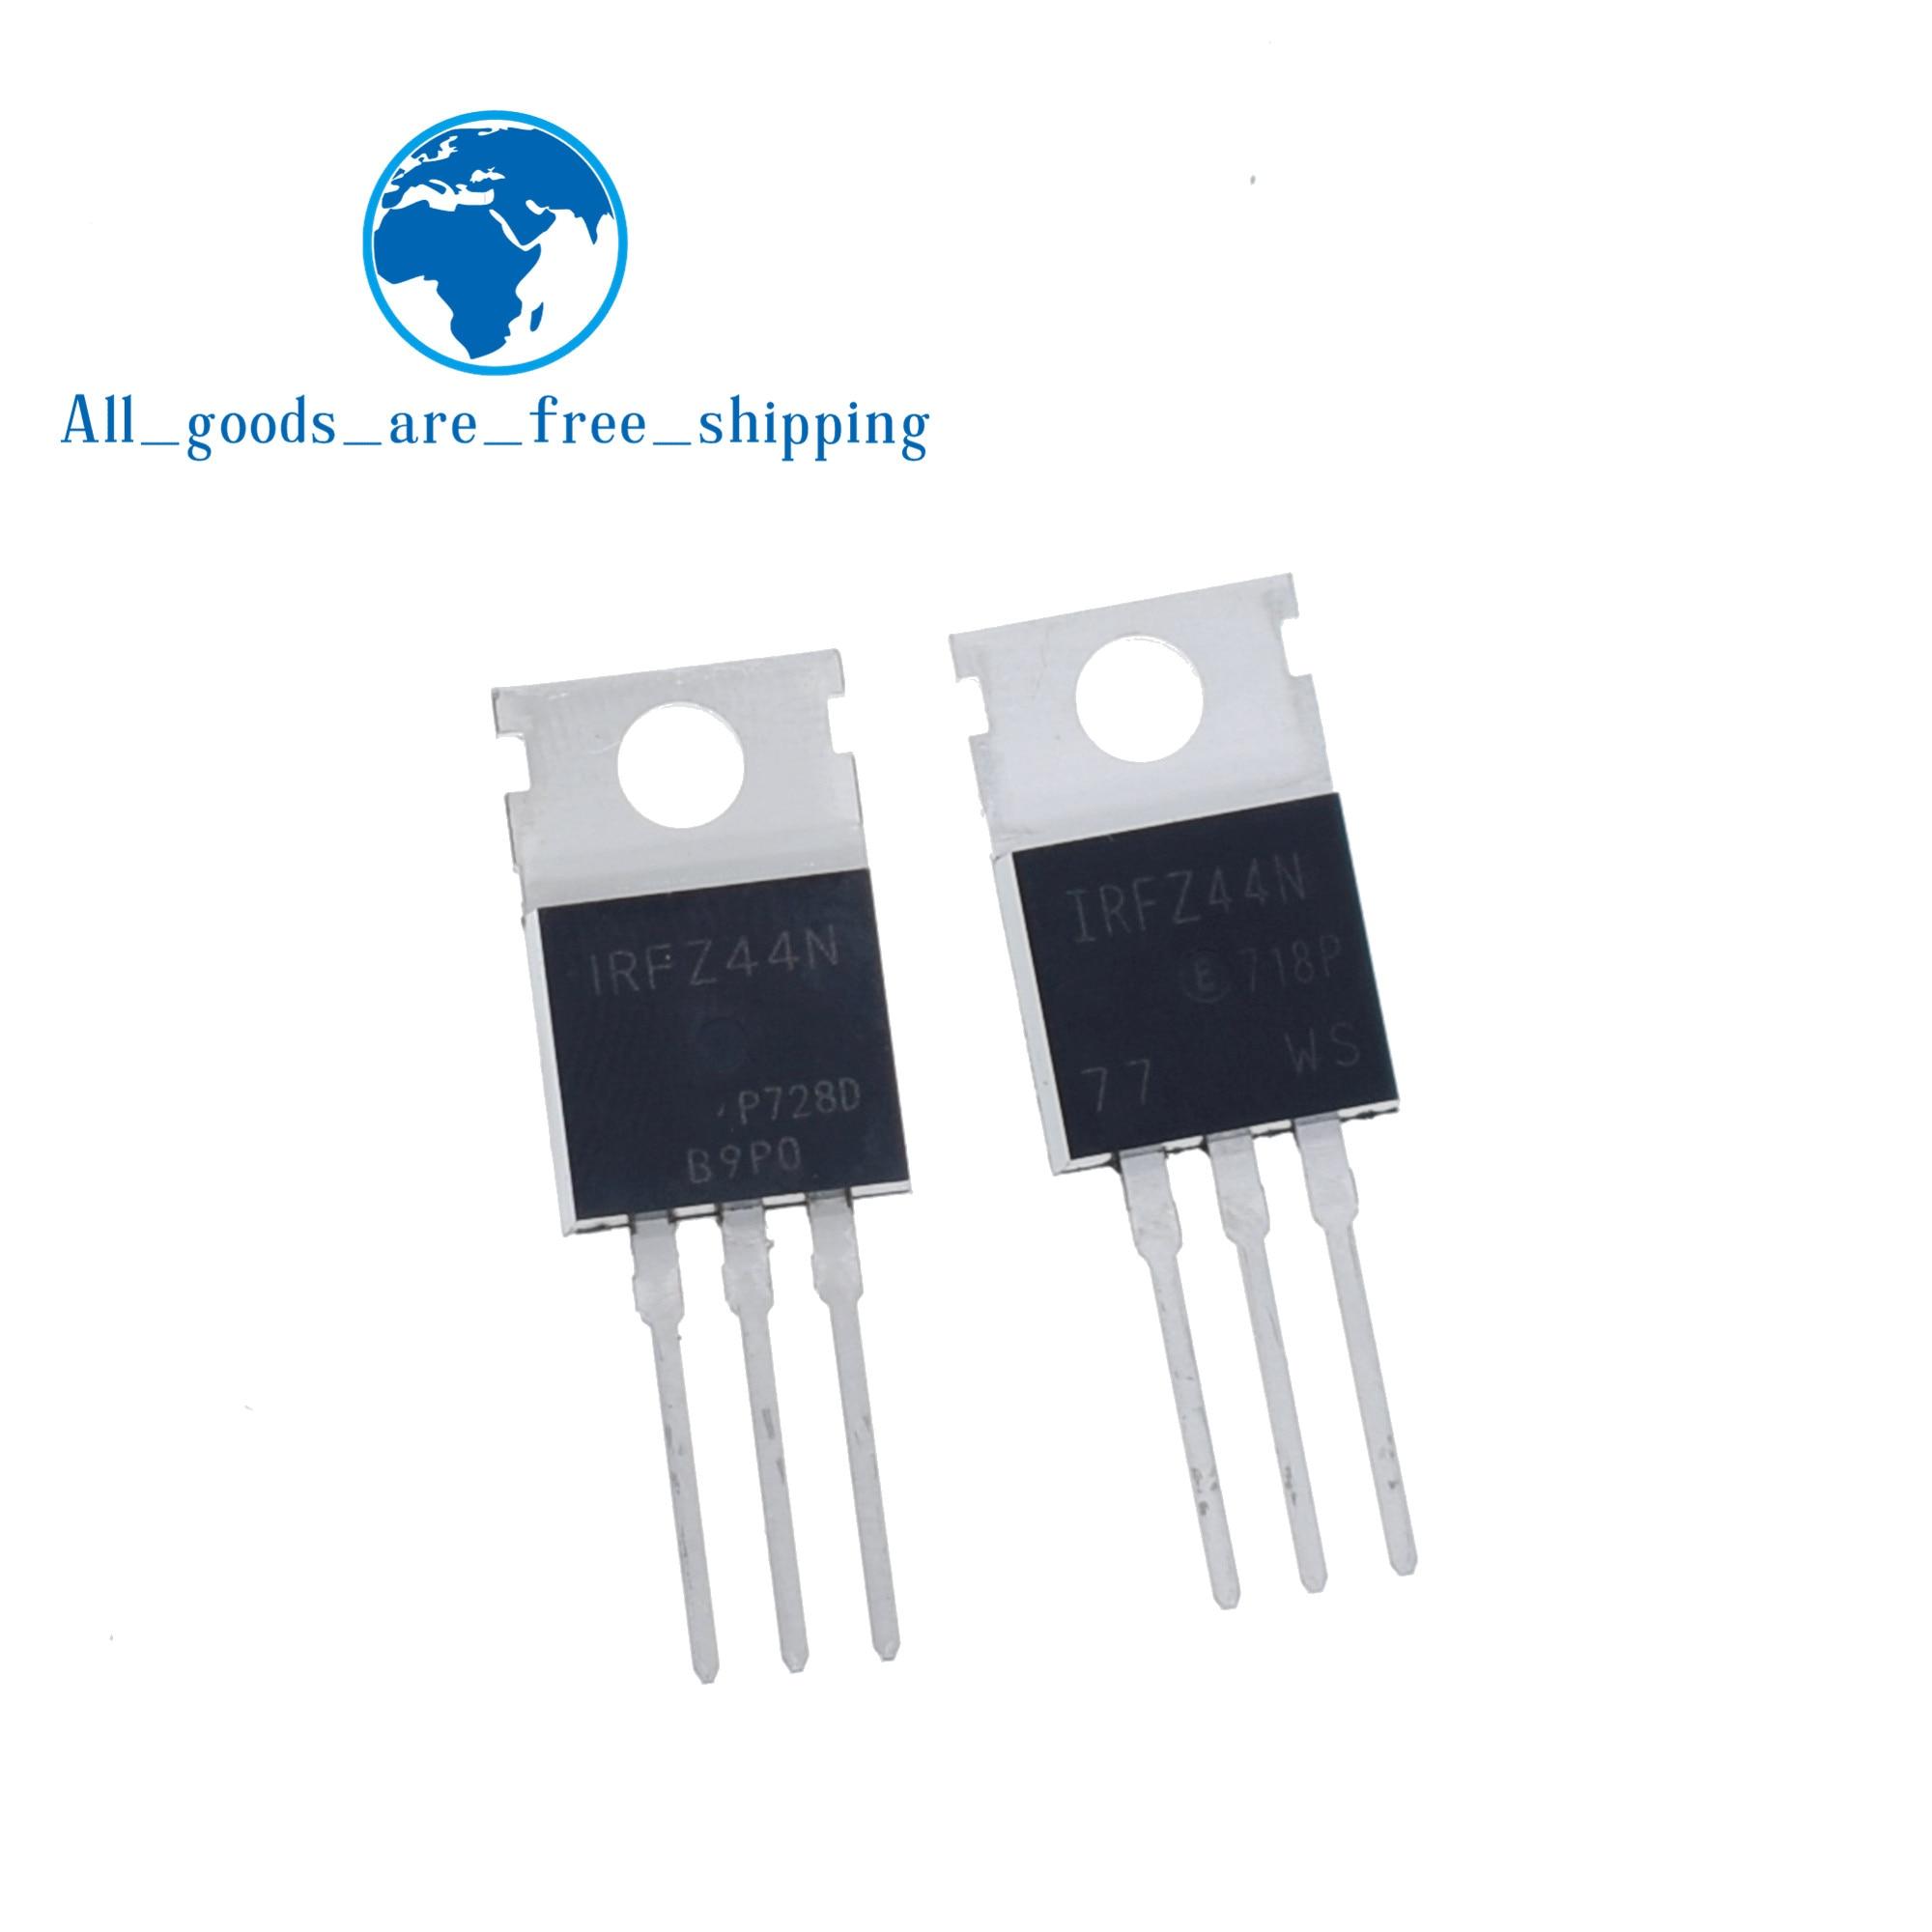 10pcs IRFZ44N IRFZ44 Power MOSFET 49A 55V TO-220